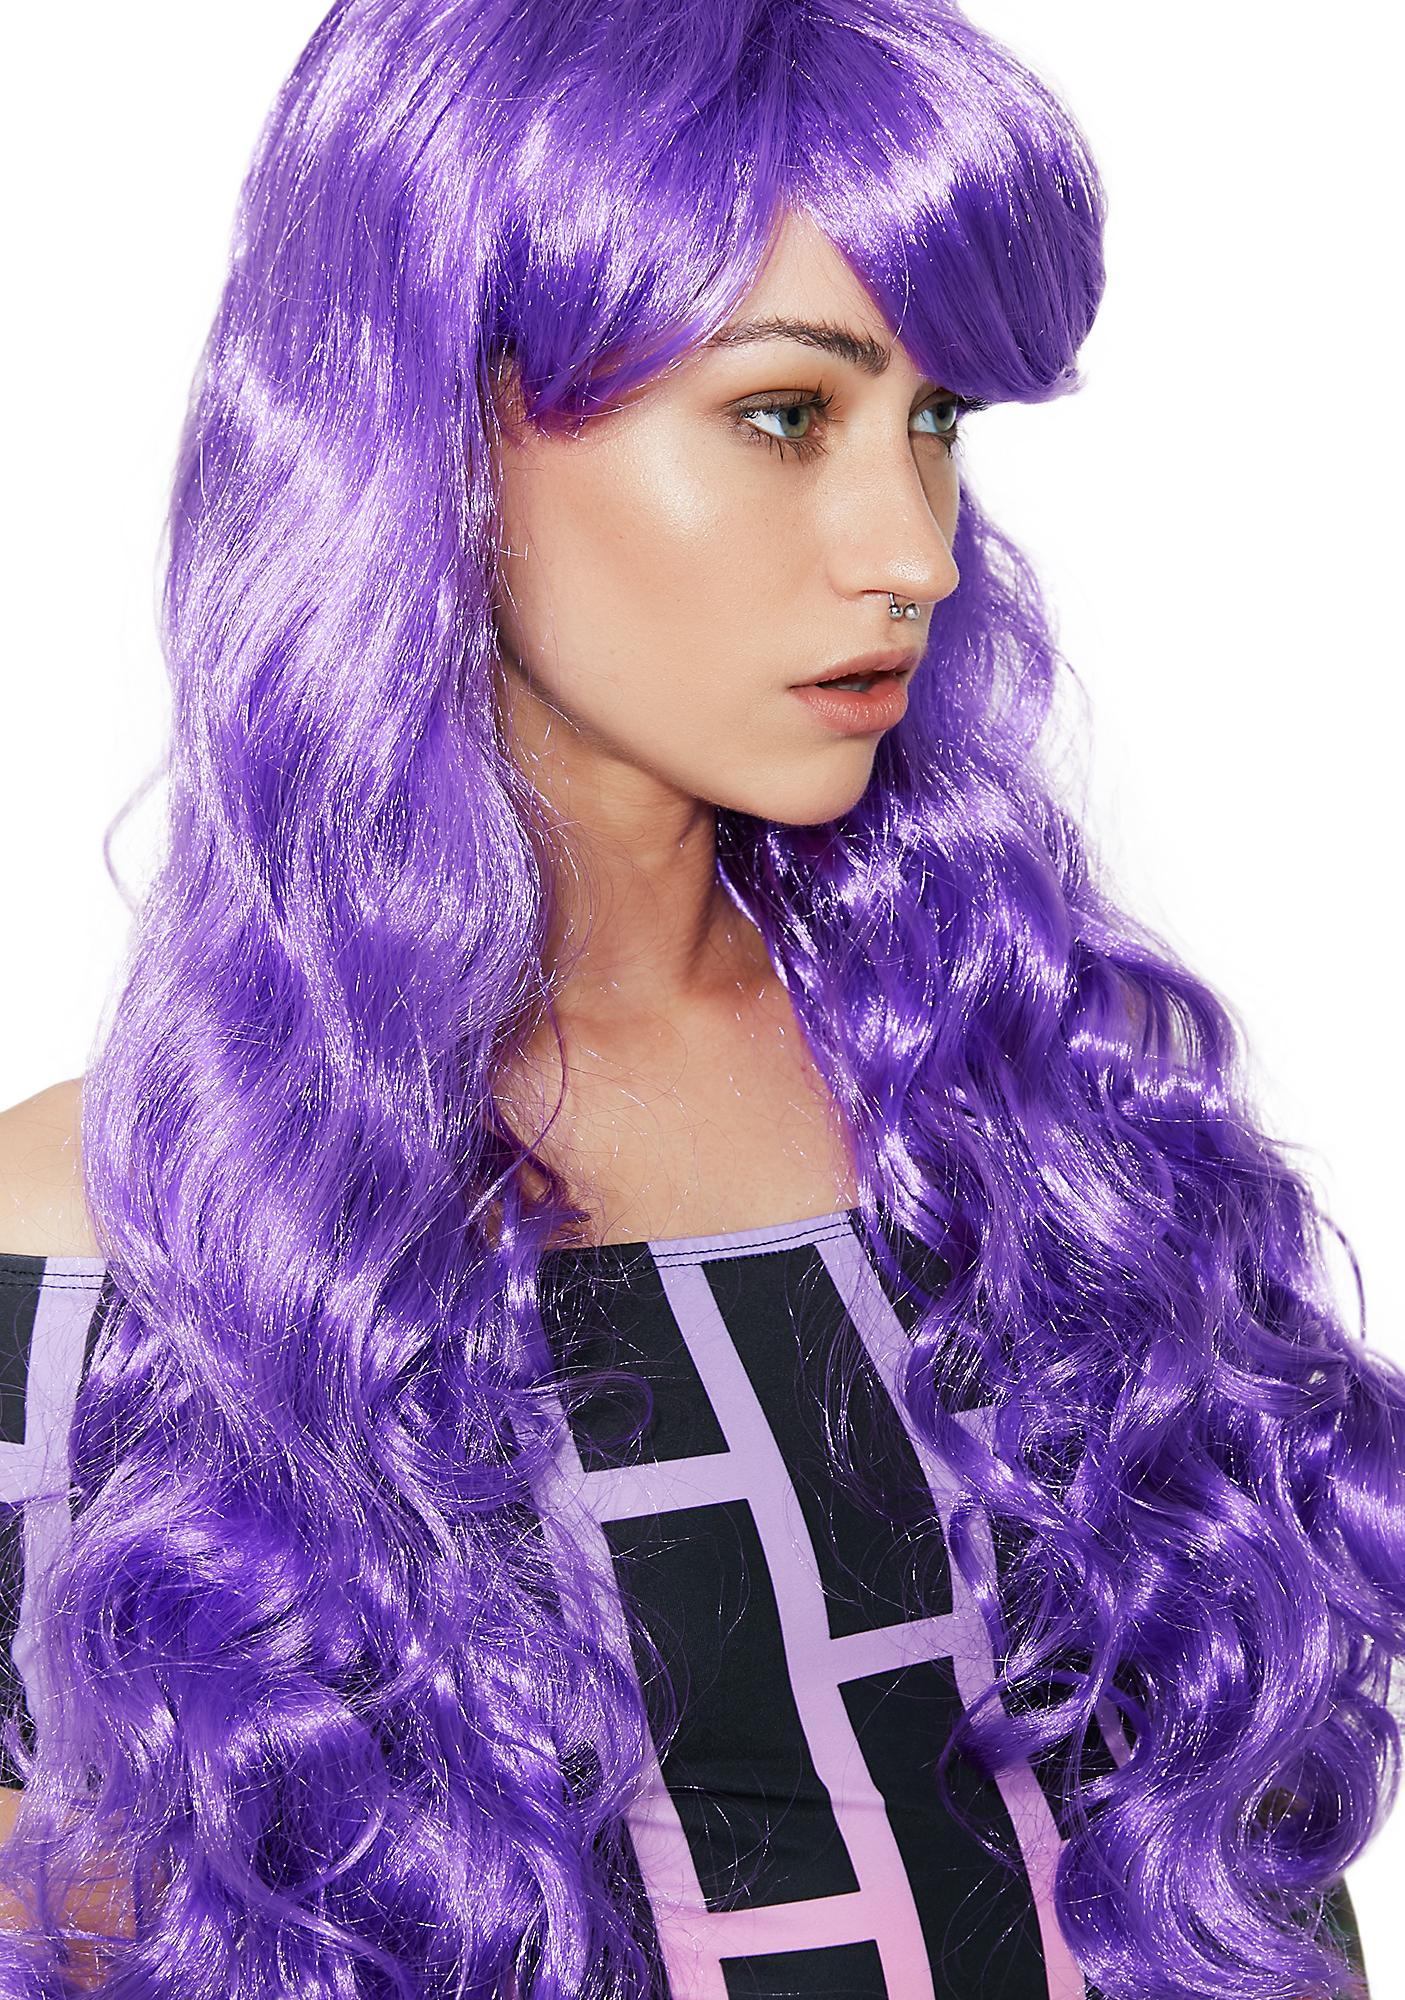 Starbright Wavy Wig